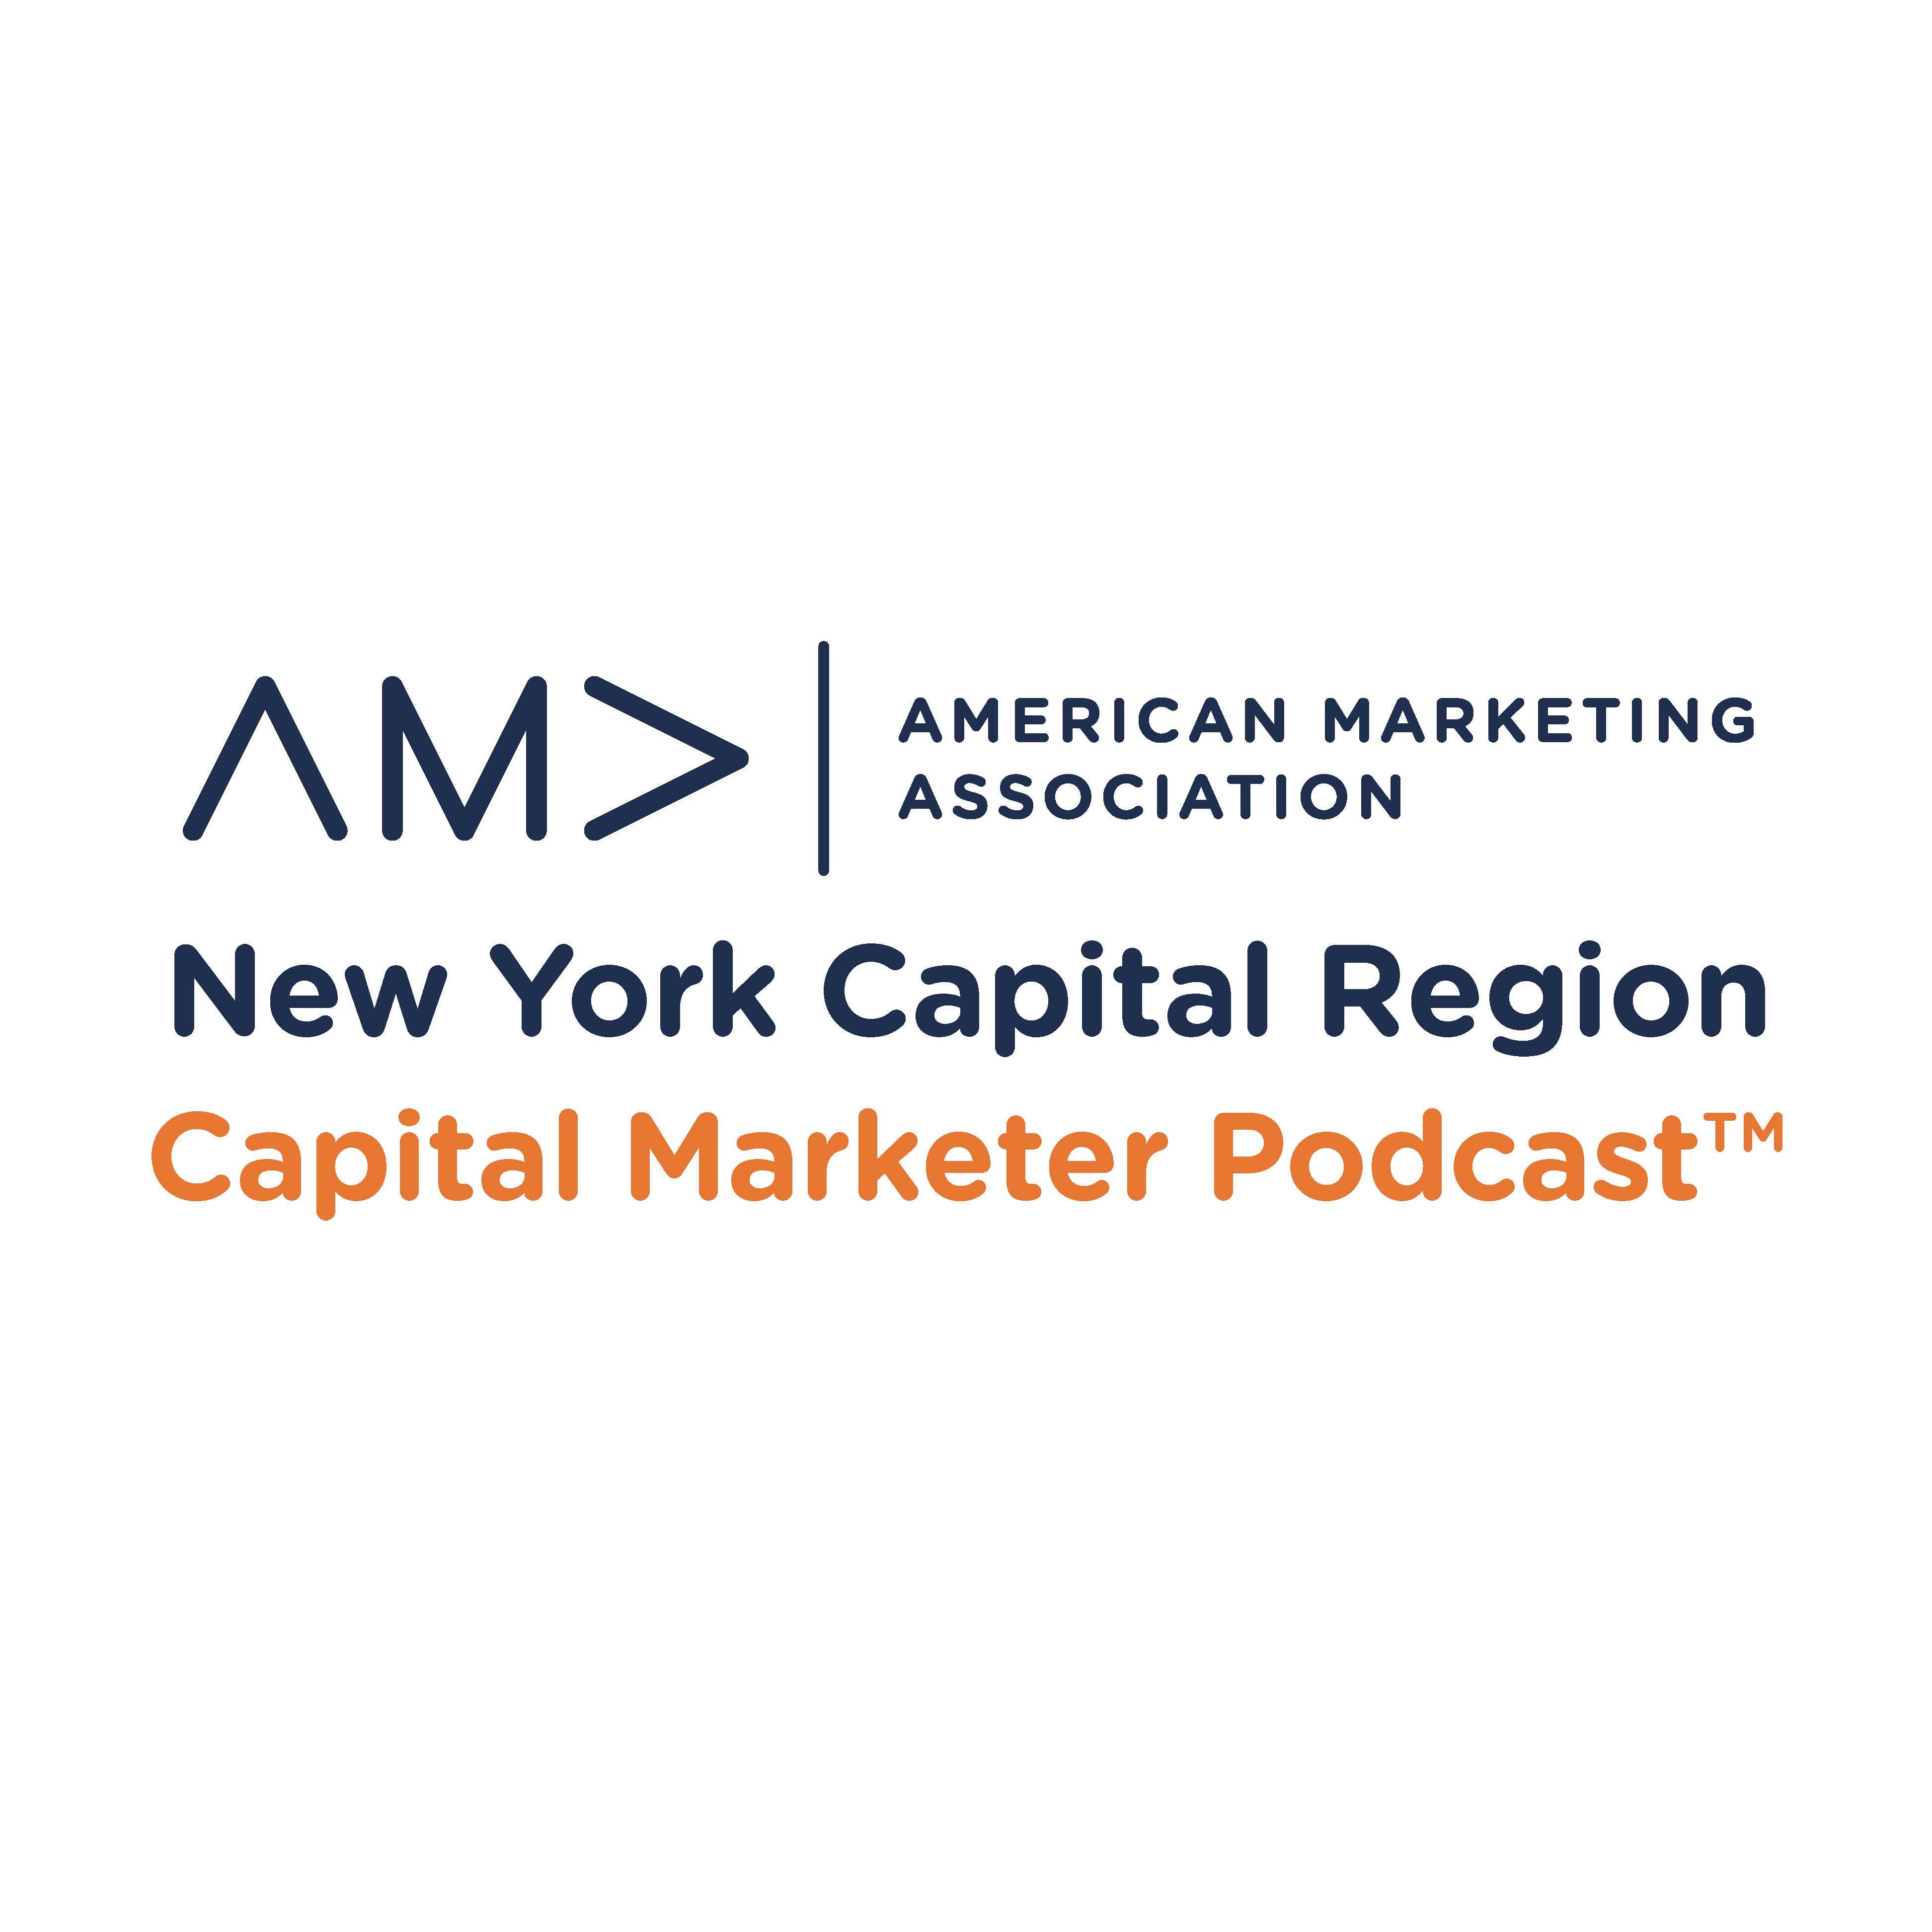 Capital Marketer Podcast show art